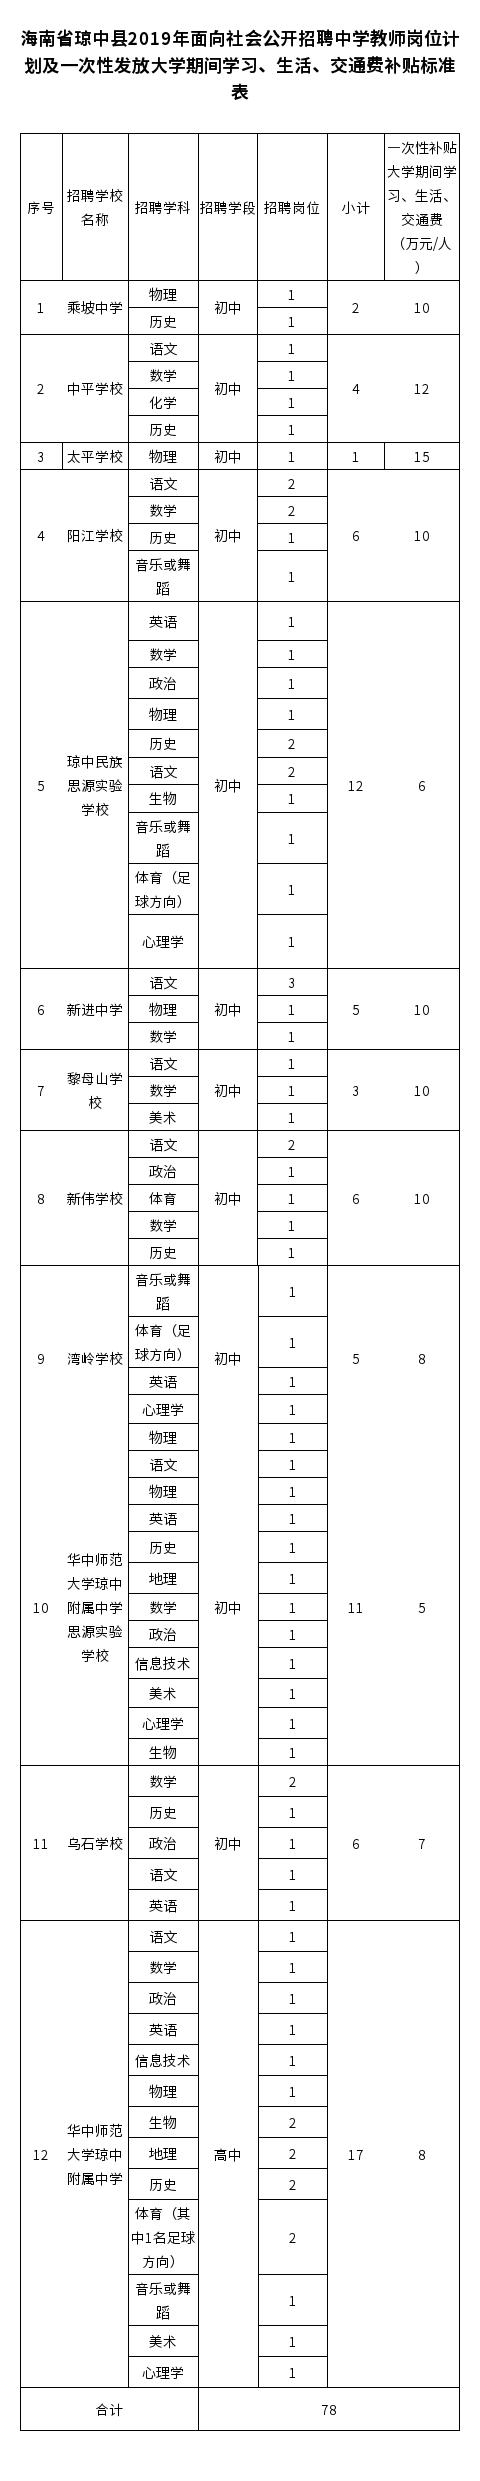 http://www.yhkjzs.com/haikoufangchan/14875.html